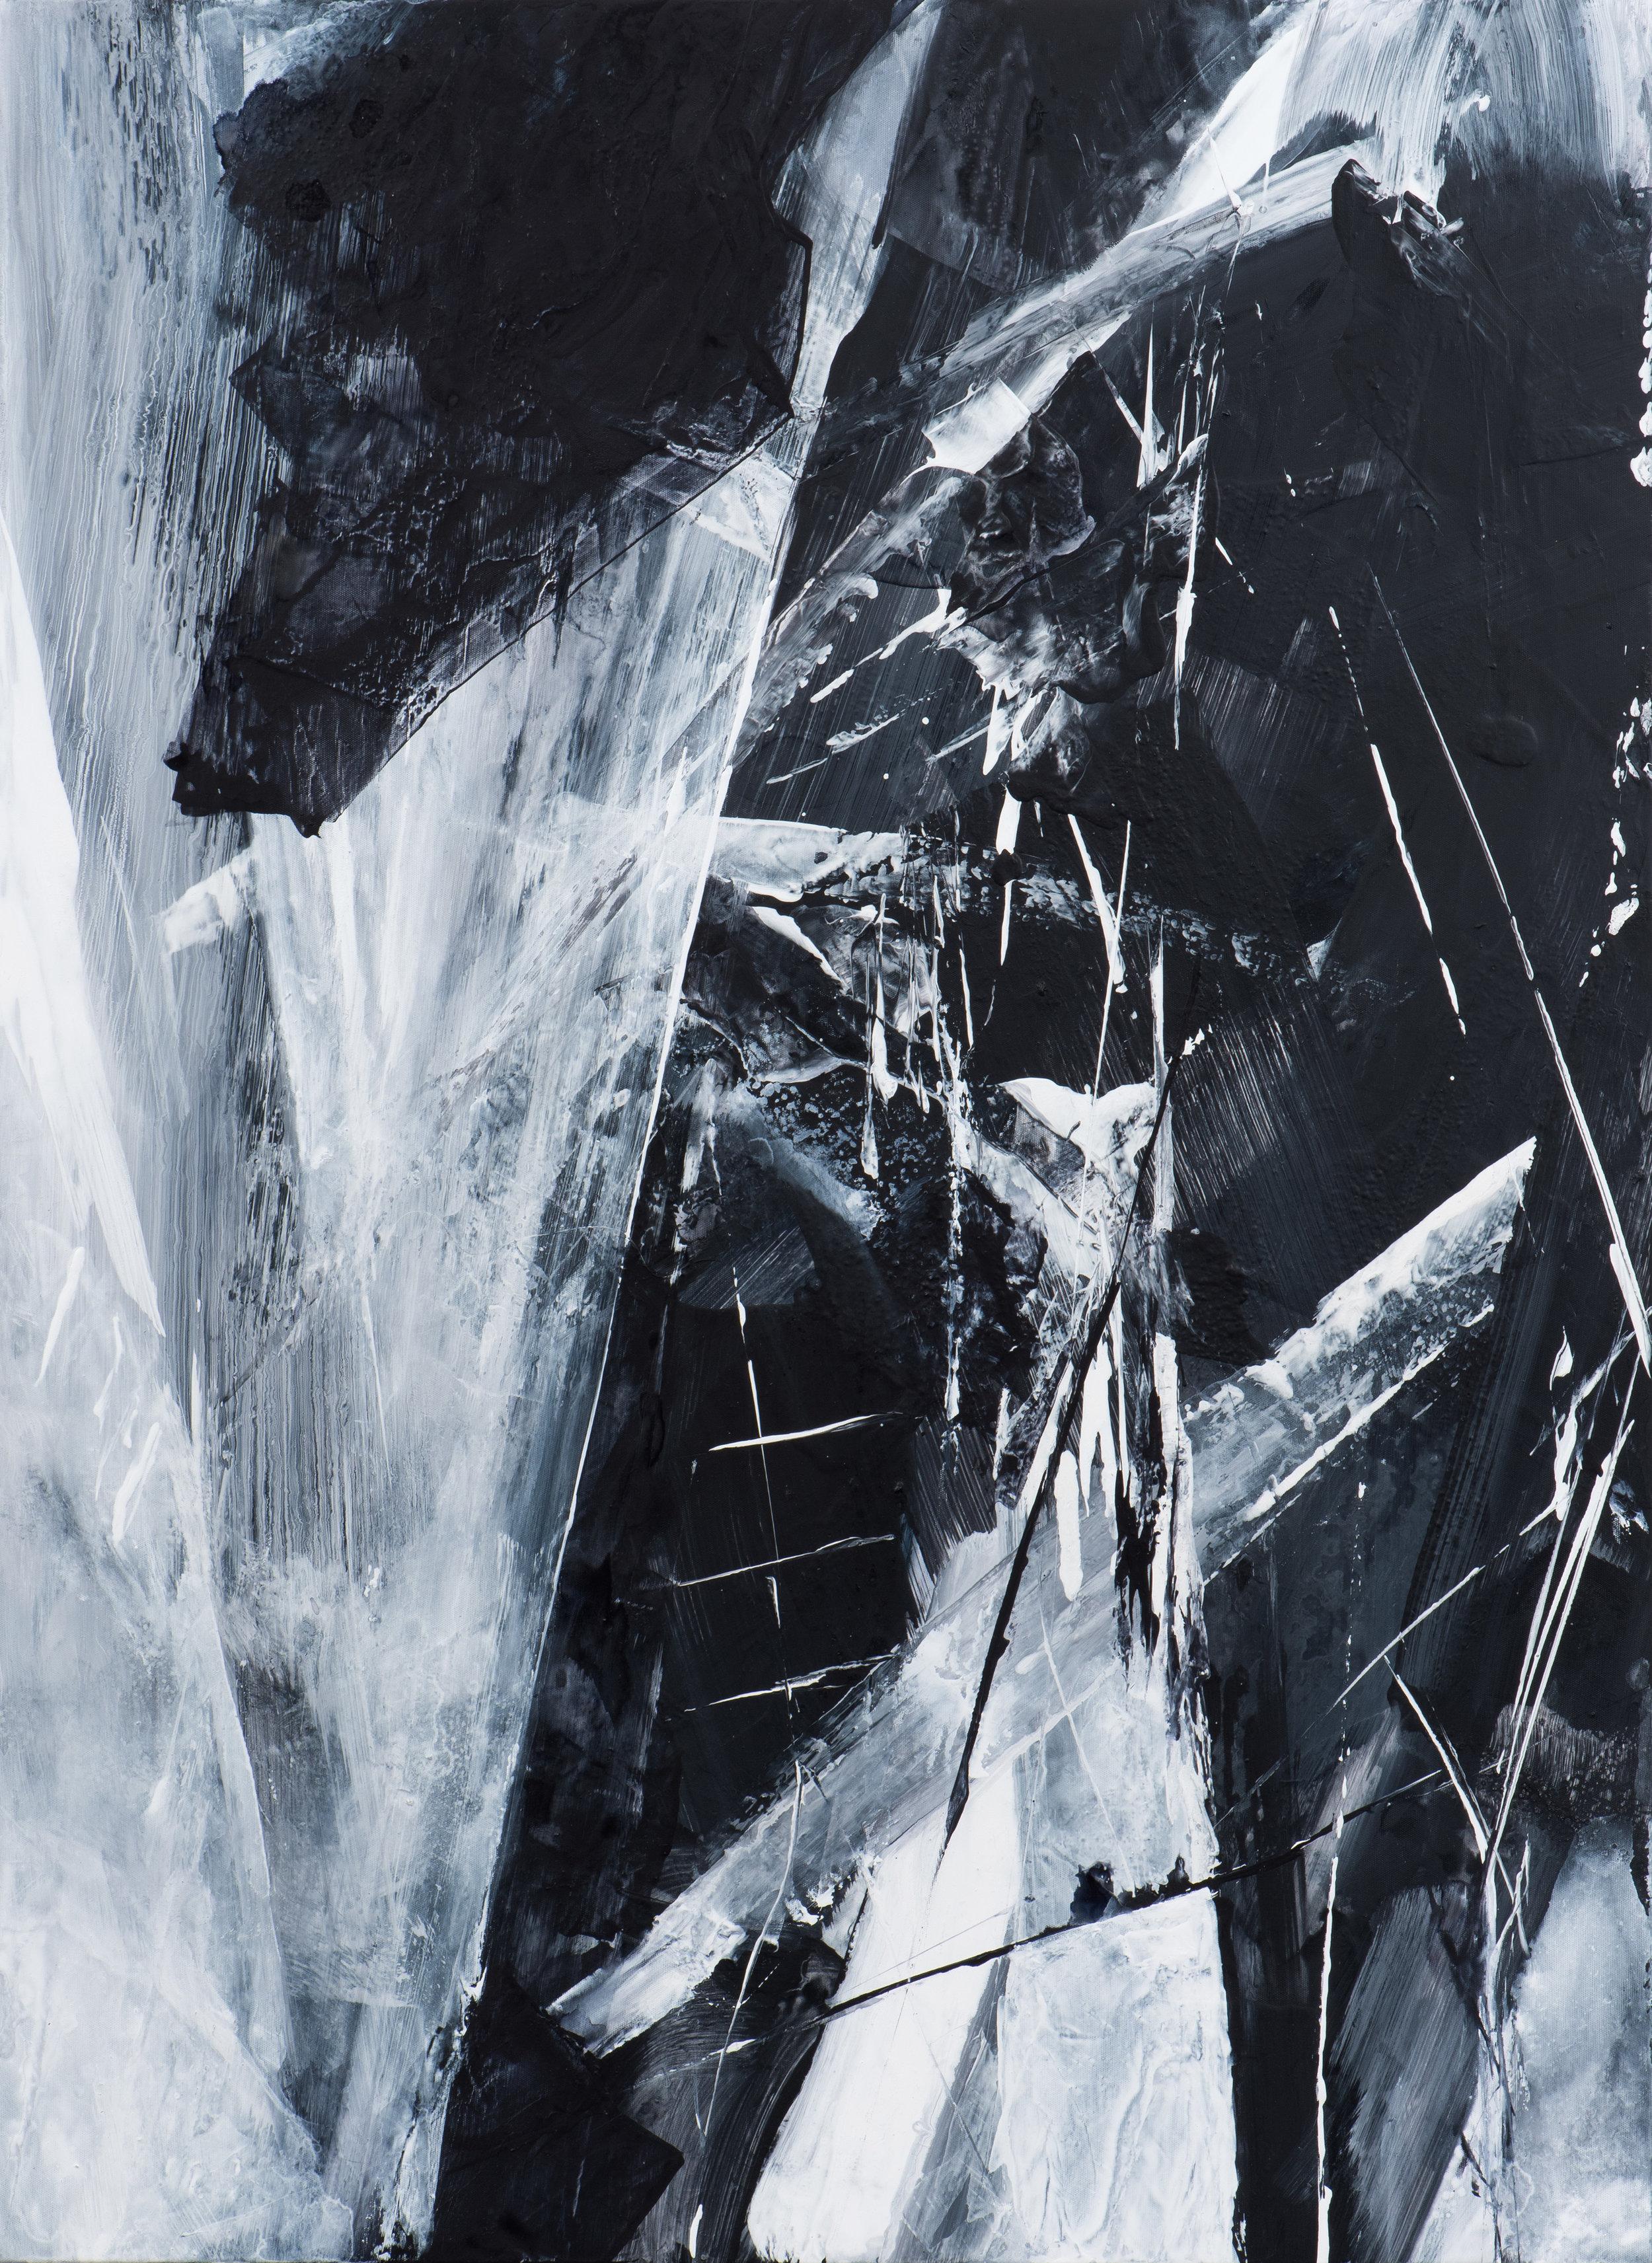 Caesura , 2017 Acrylic on polyester 33 x 19 inches CLBA-0047 $3600